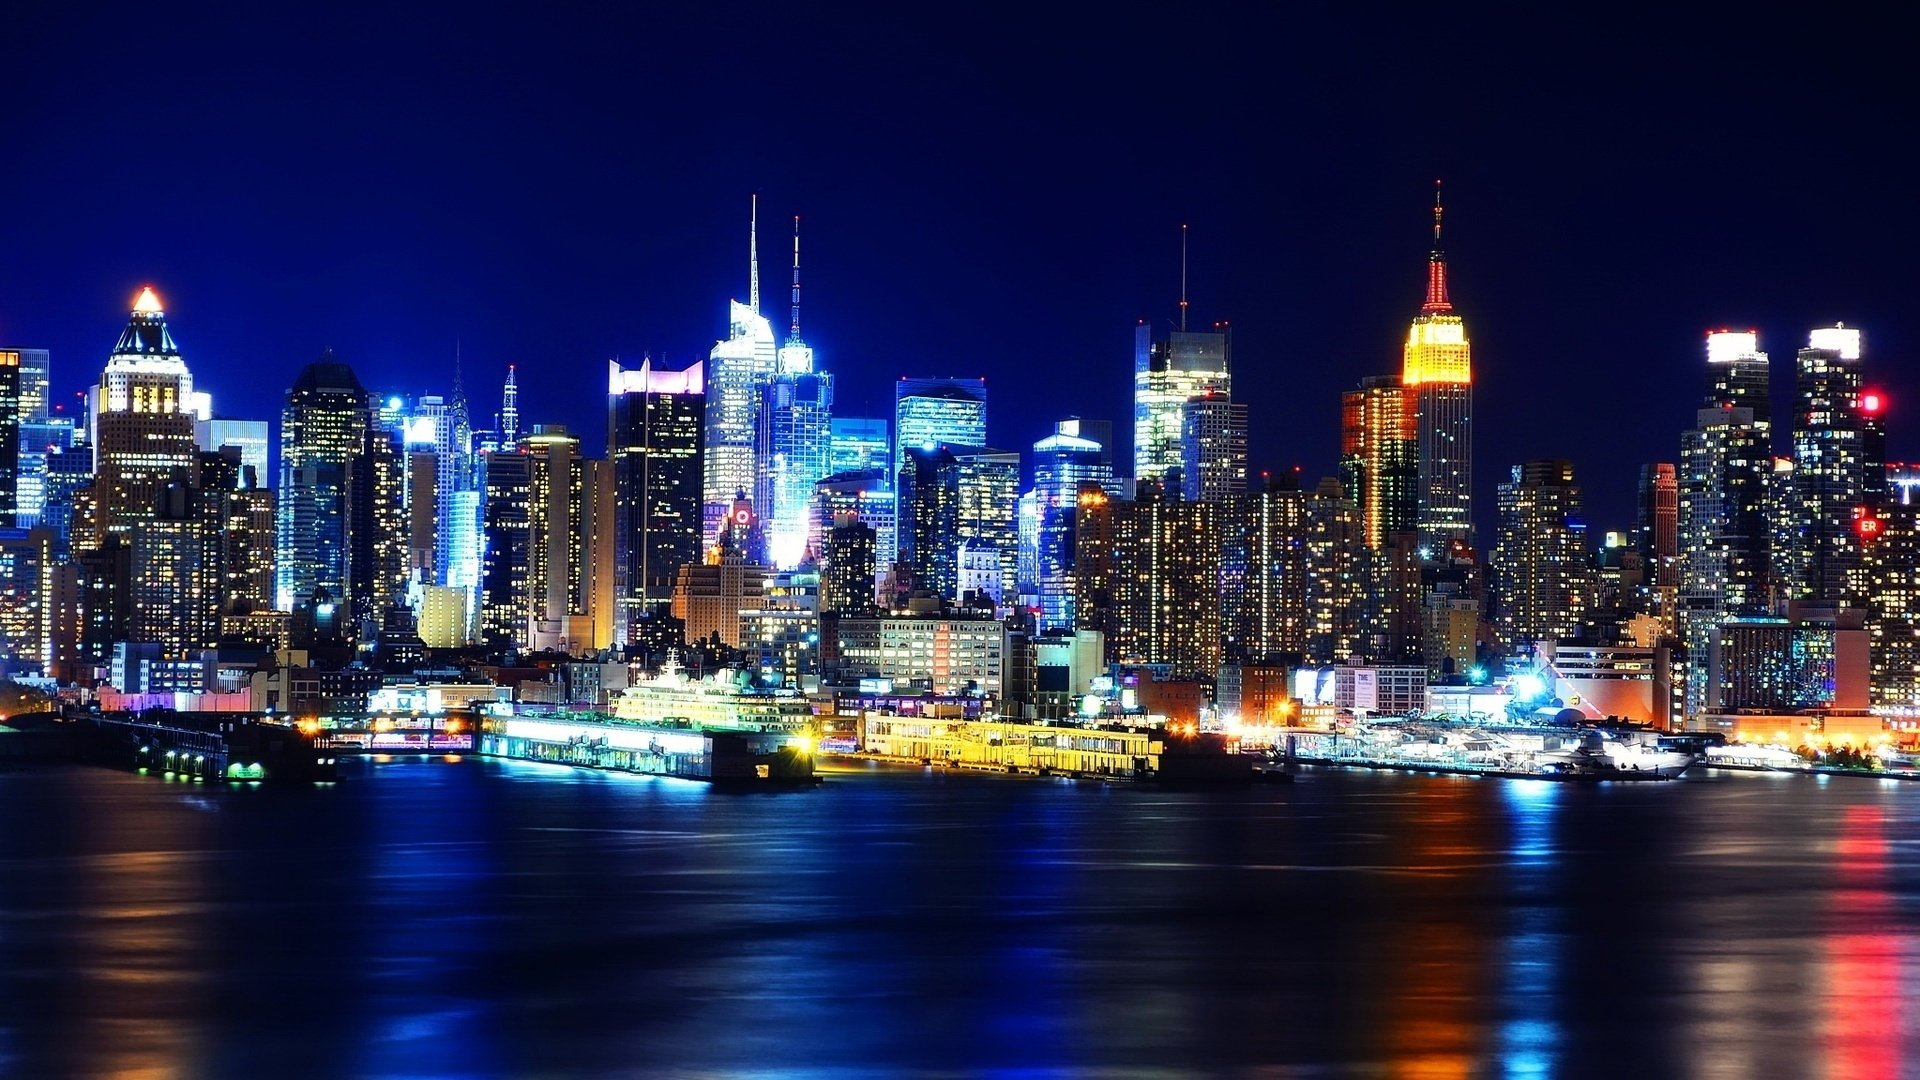 Man Made - City  New York Night Light Photography Wallpaper